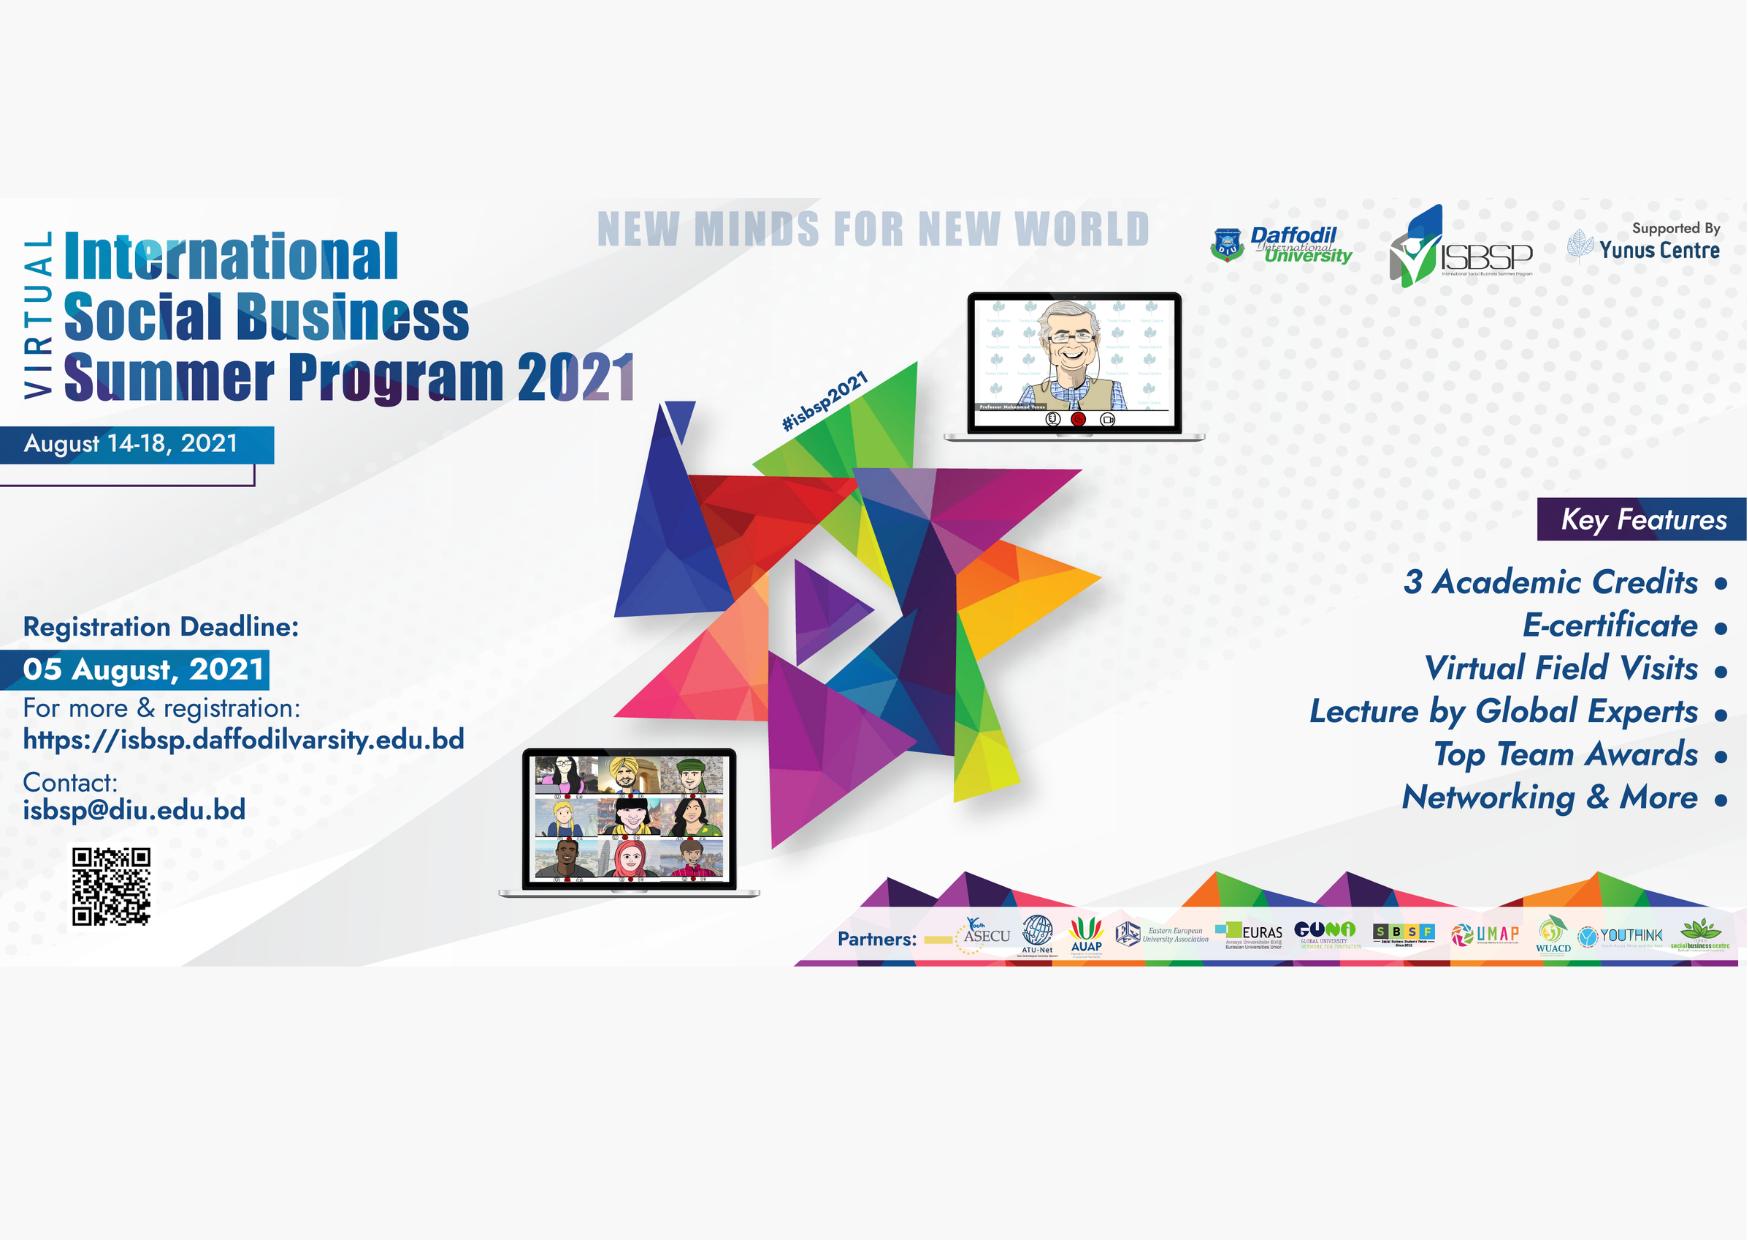 Daffodil International University is organizing a Social Business Summer Program 2021